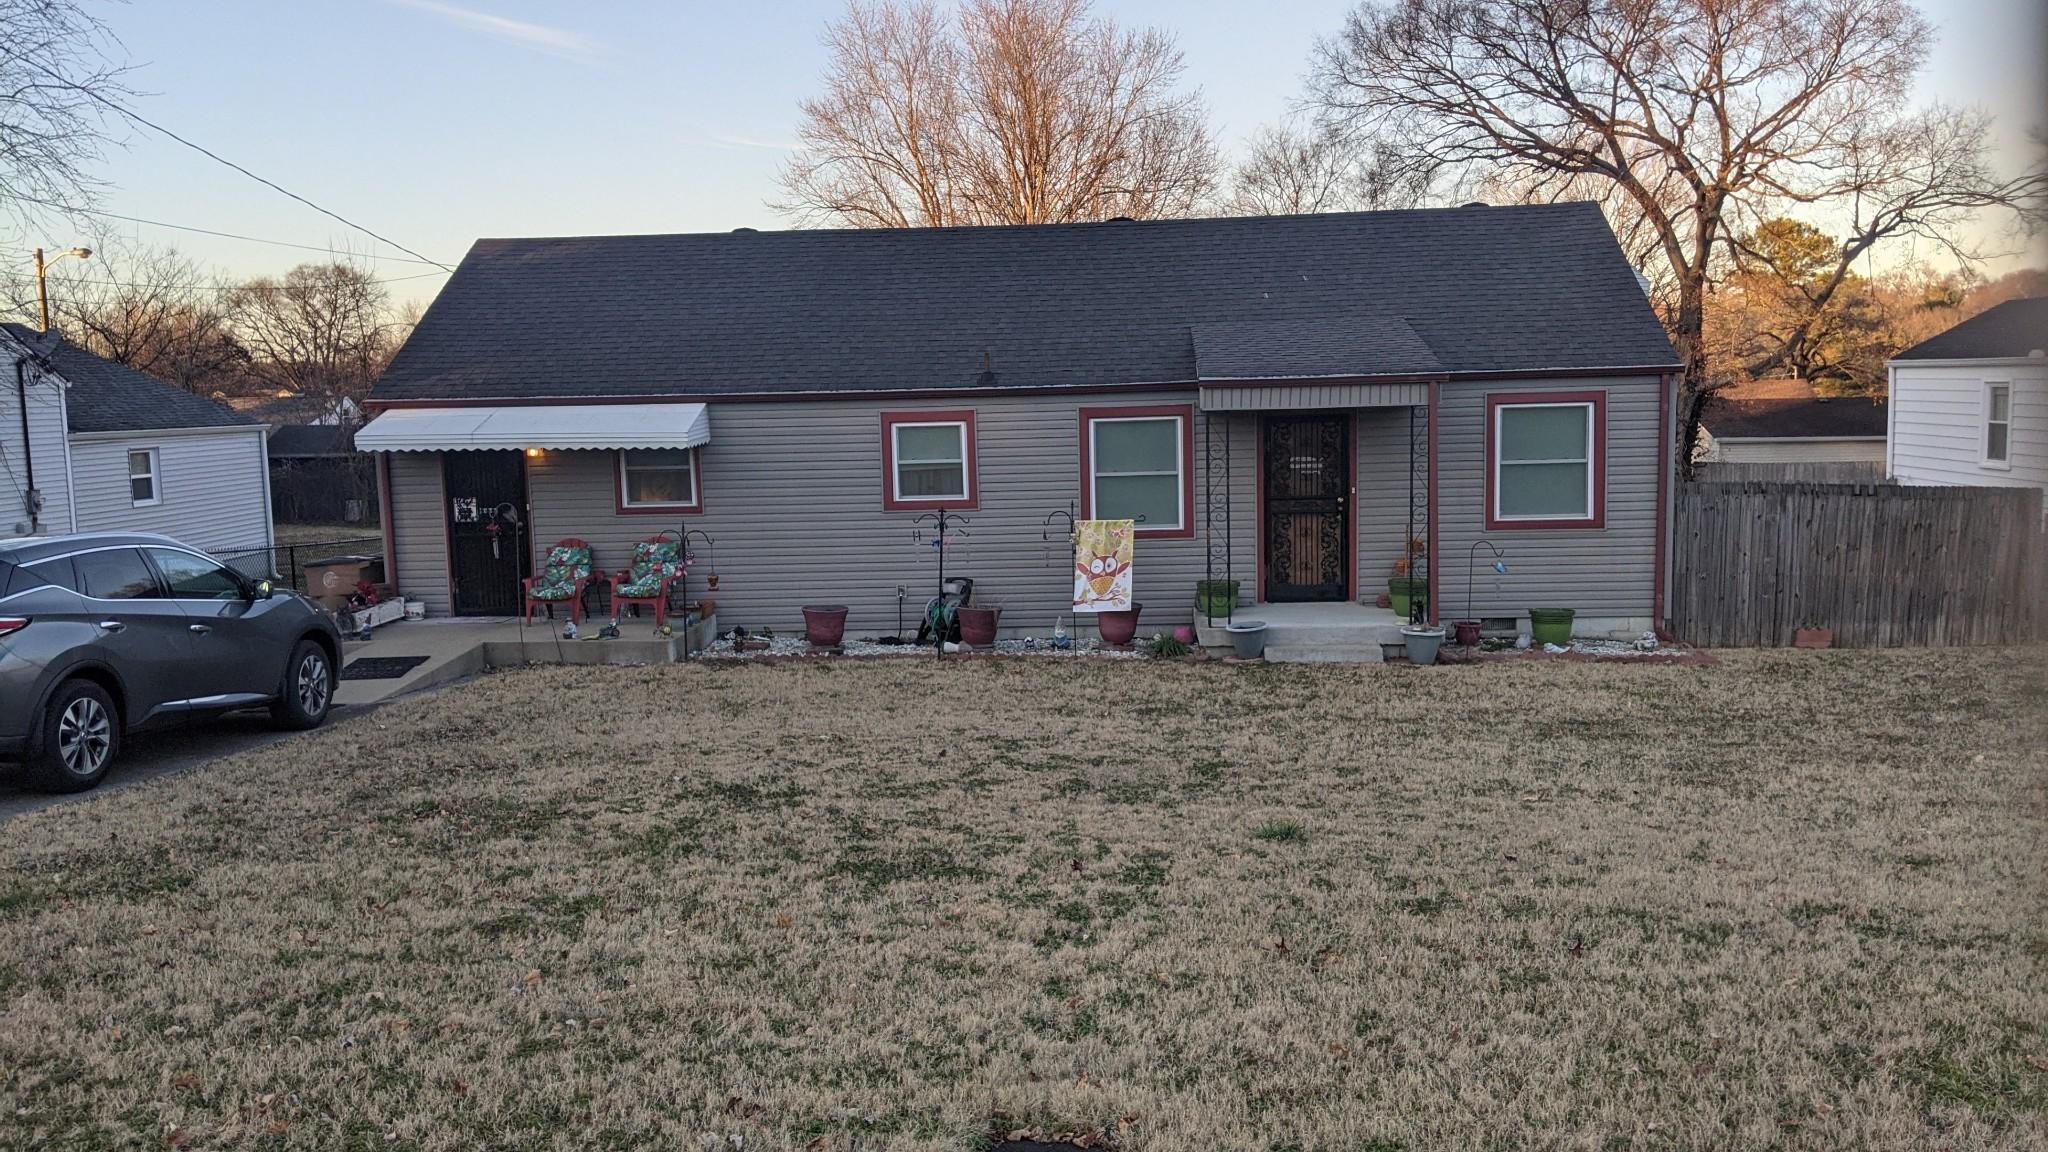 60 Peachtree St Property Photo - Nashville, TN real estate listing